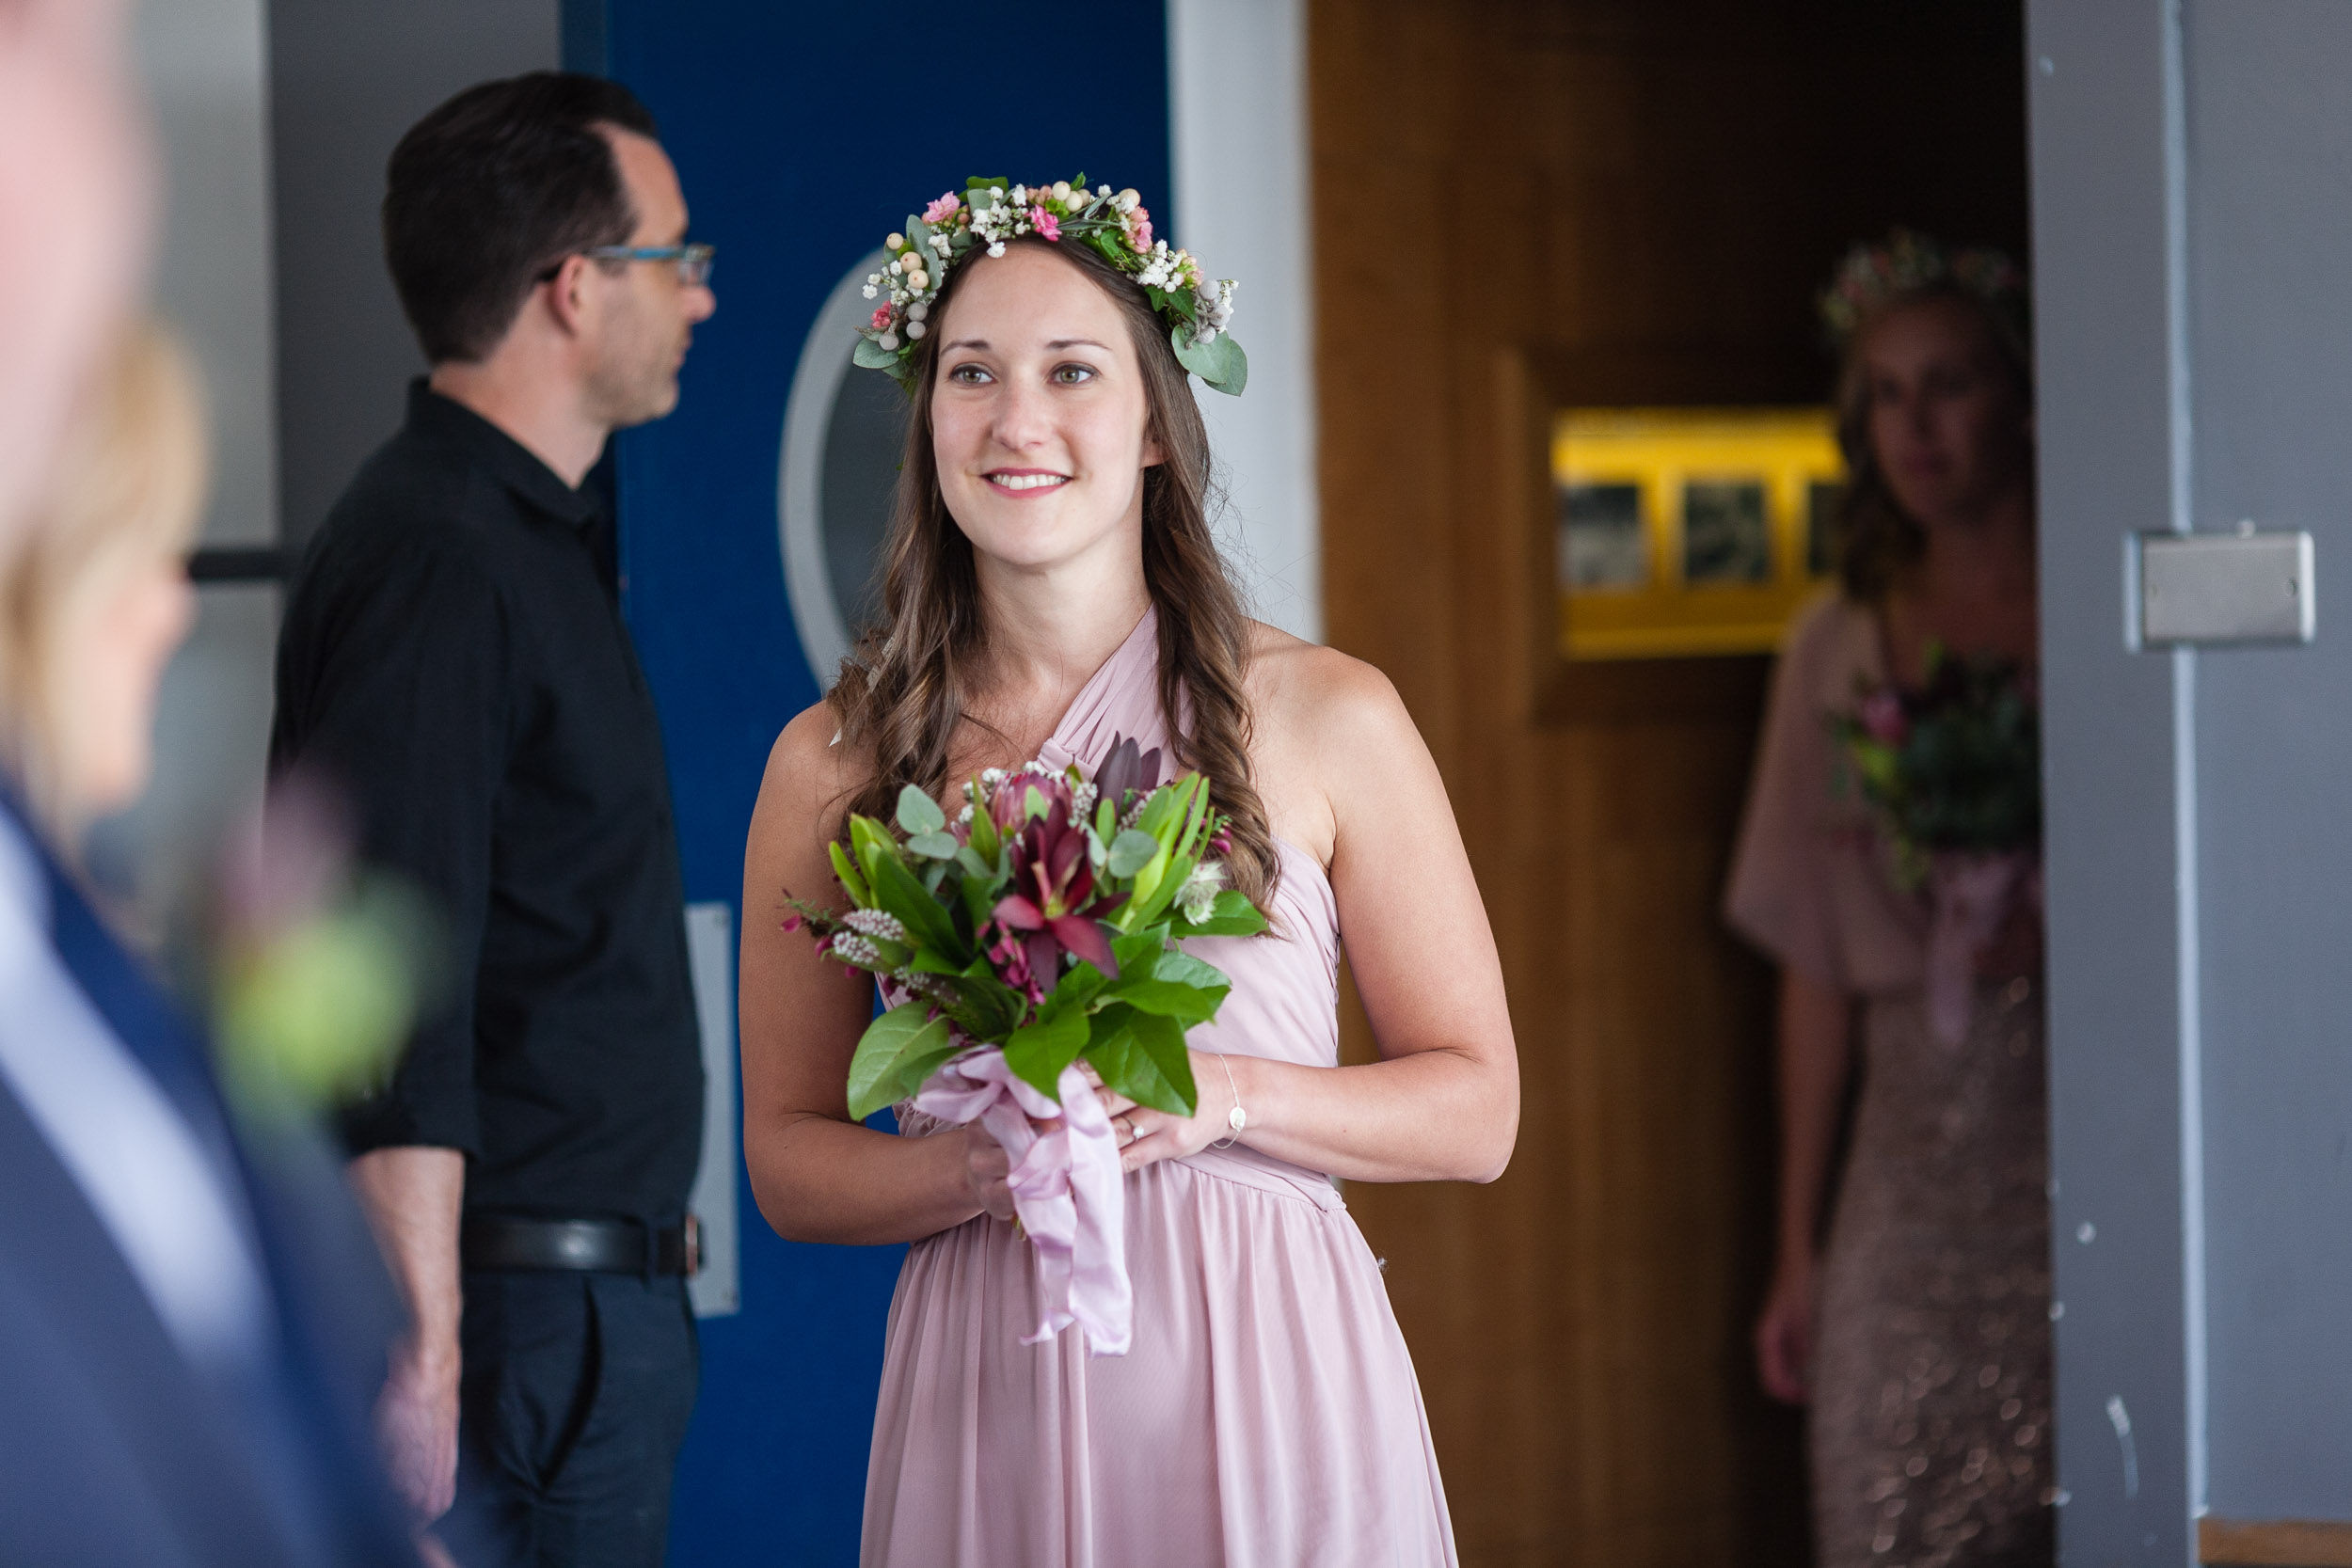 brockwell-lido-brixton-herne-hill-wedding-115.jpg